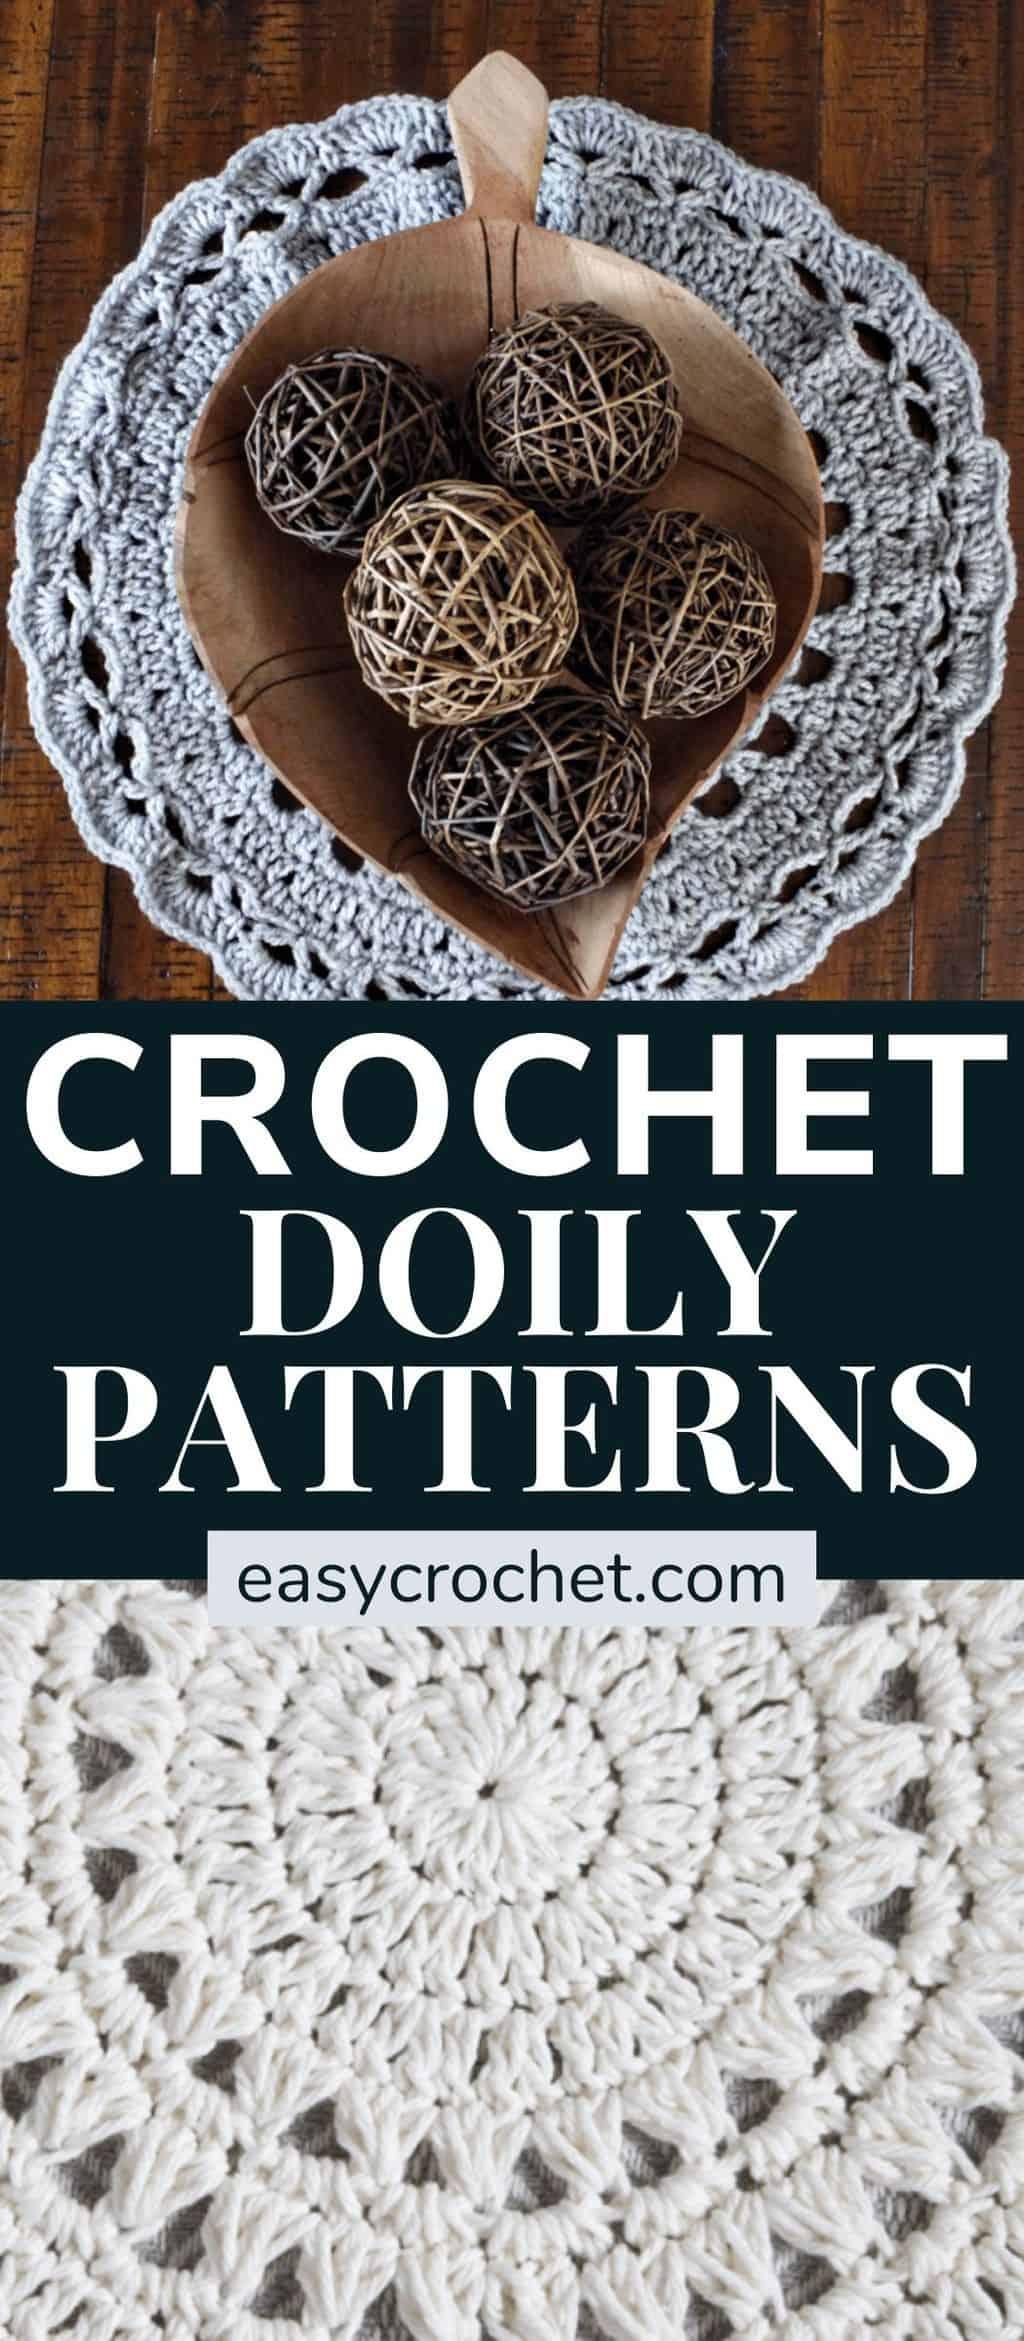 Crochet Doilies free patterns